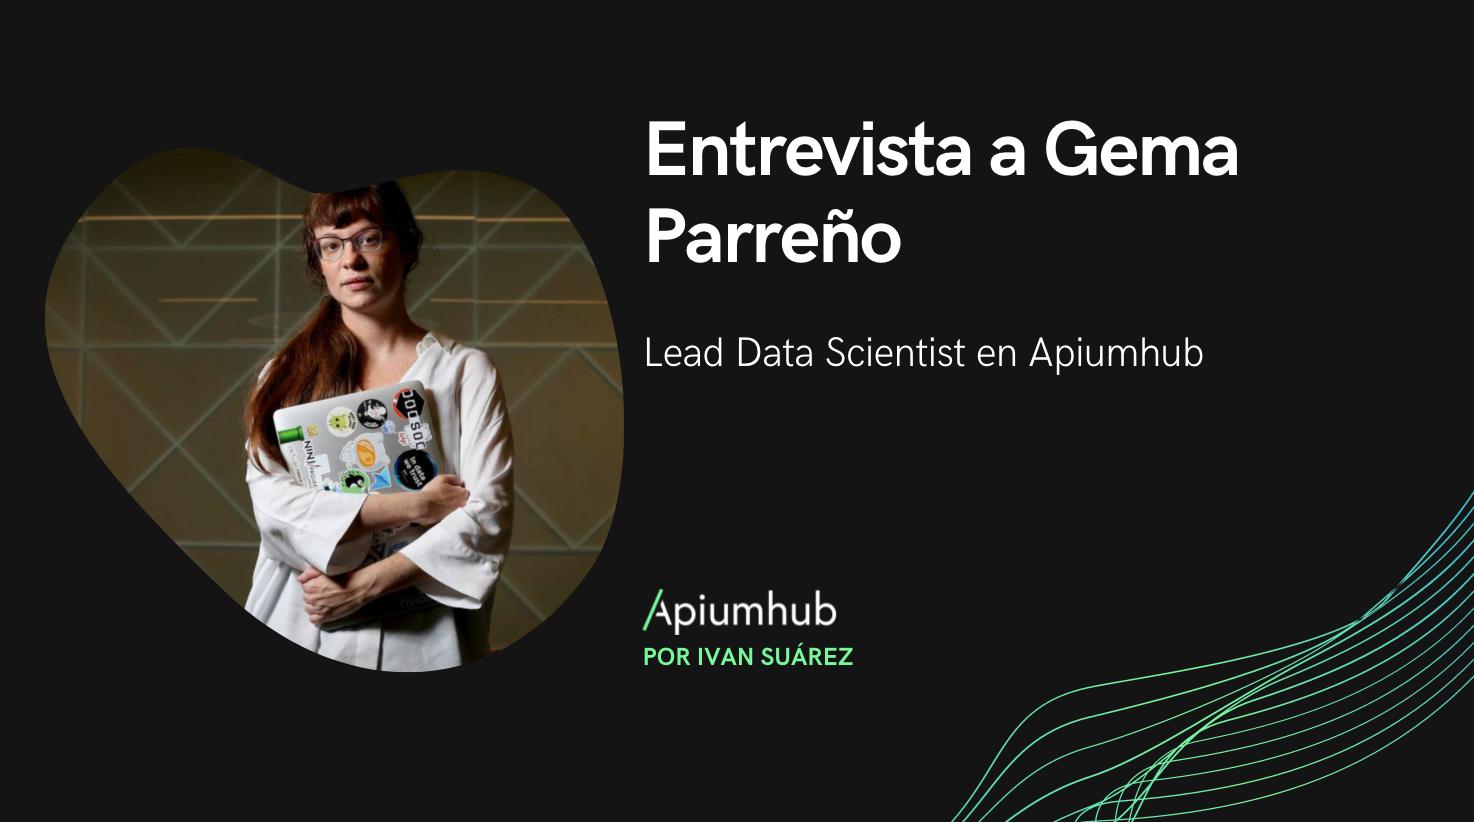 Entrevista a Gema Parreño, Lead Data Scientist en Apiumhub